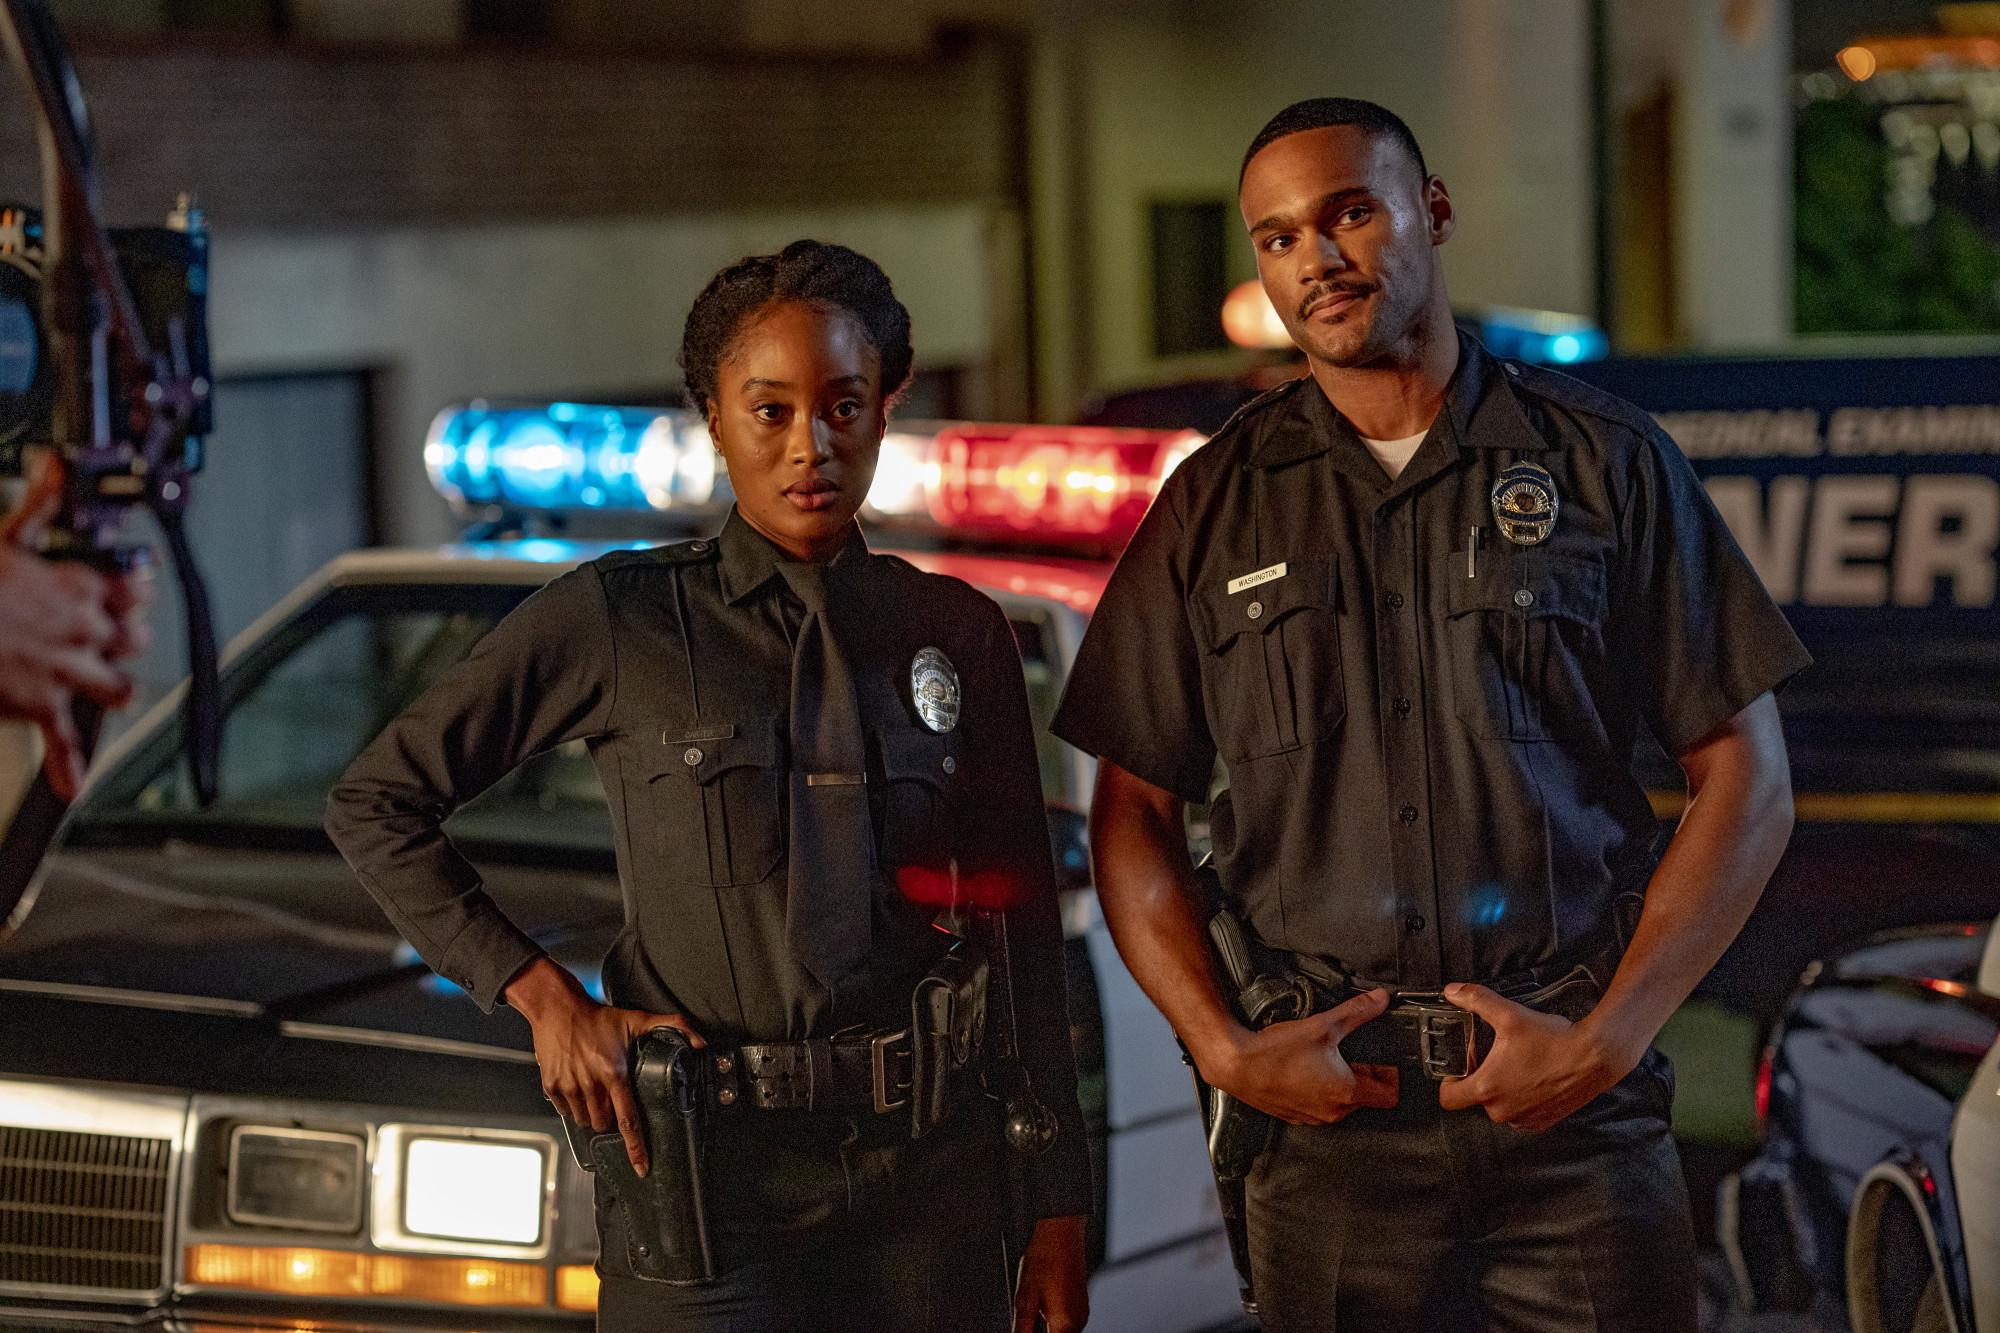 "9-1-1: L-R: Pepi Sonuga and Jeff Pierre in the ""Athena Begins"" episode of 9-1-1 airing Monday, Nov. 4 (8:00-9:01 PM ET/PT) on FOX. © 2019 FOX MEDIA LLC. CR: Jack Zeman / FOX."